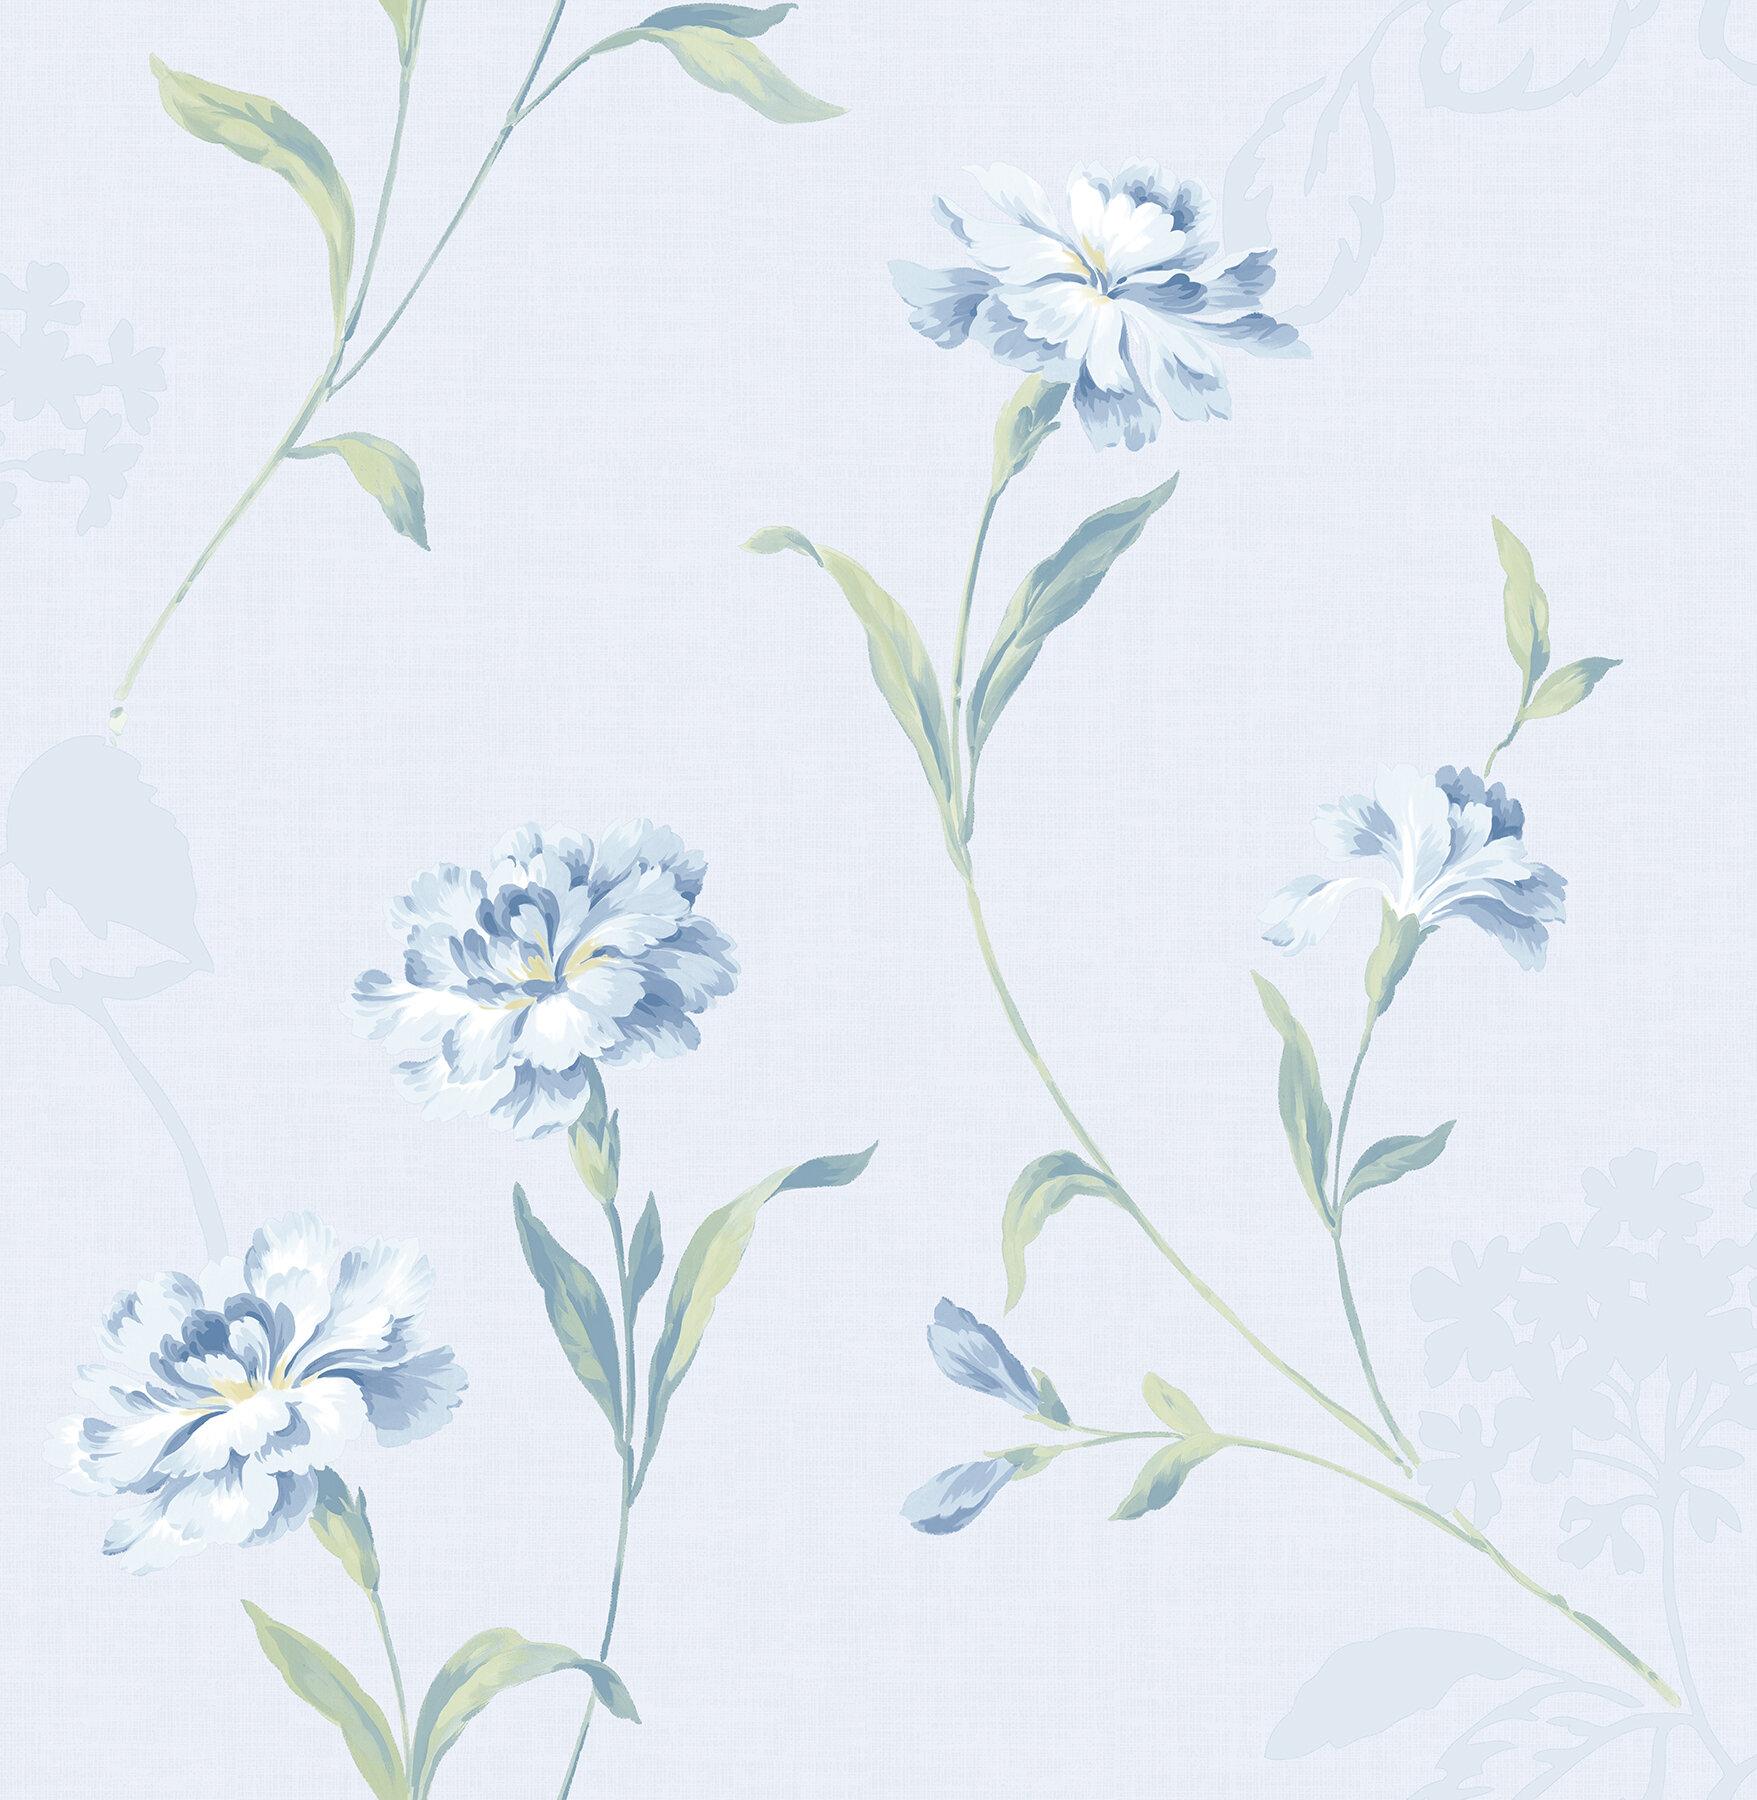 House Of Hampton Cristiano Floral 33 X 20 5 Wallpaper Roll Wayfair